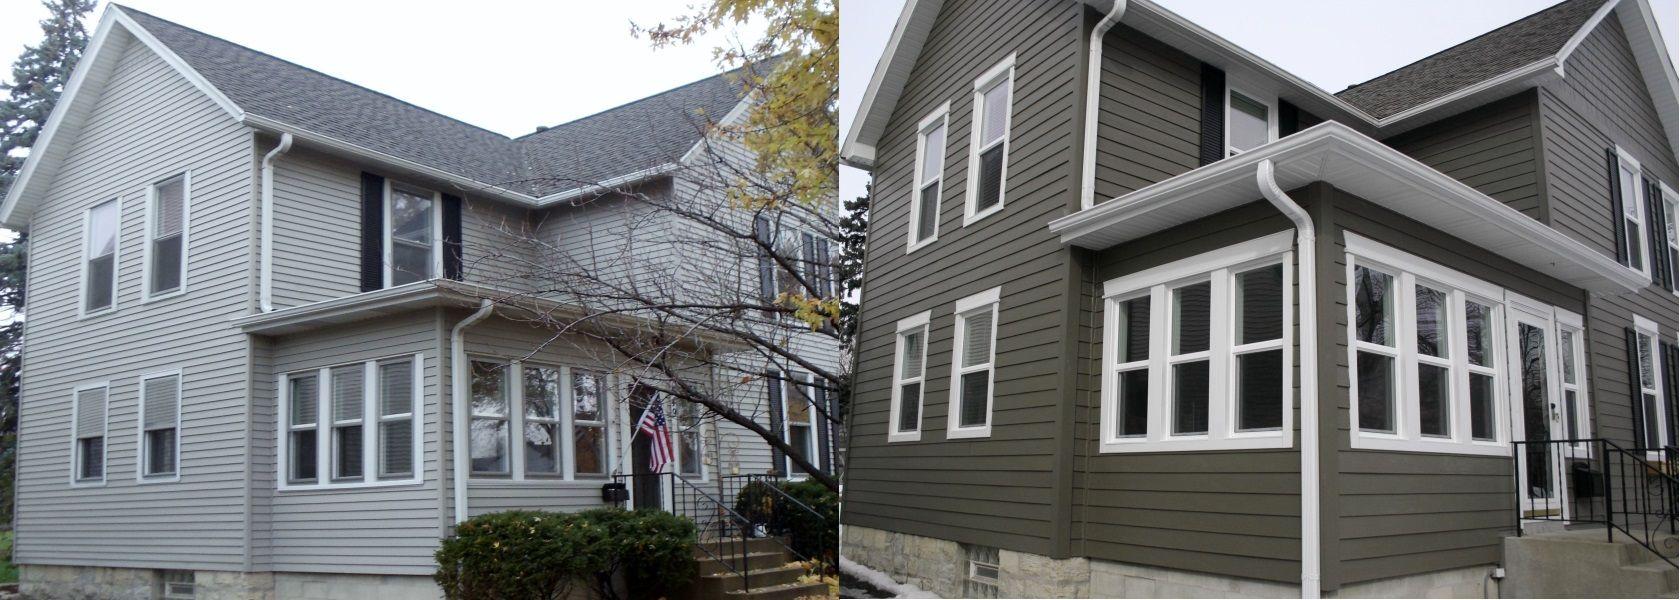 Siding Windows Roofing Contractors Naperville Il Exterior House Siding House Siding Exterior House Colors